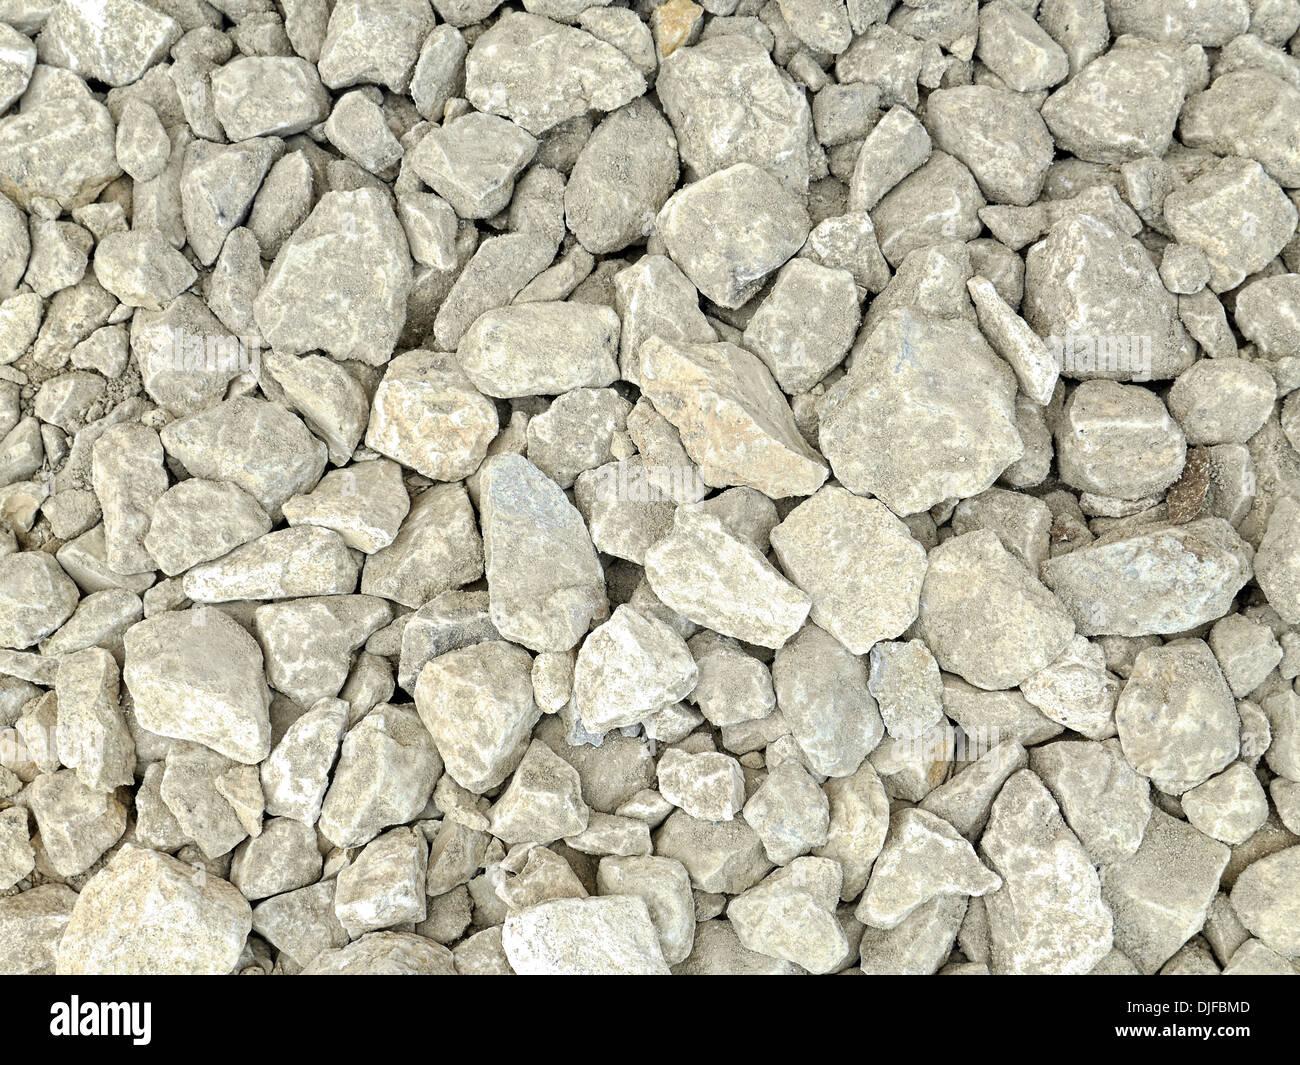 Background of gray crushed stone - Stock Image